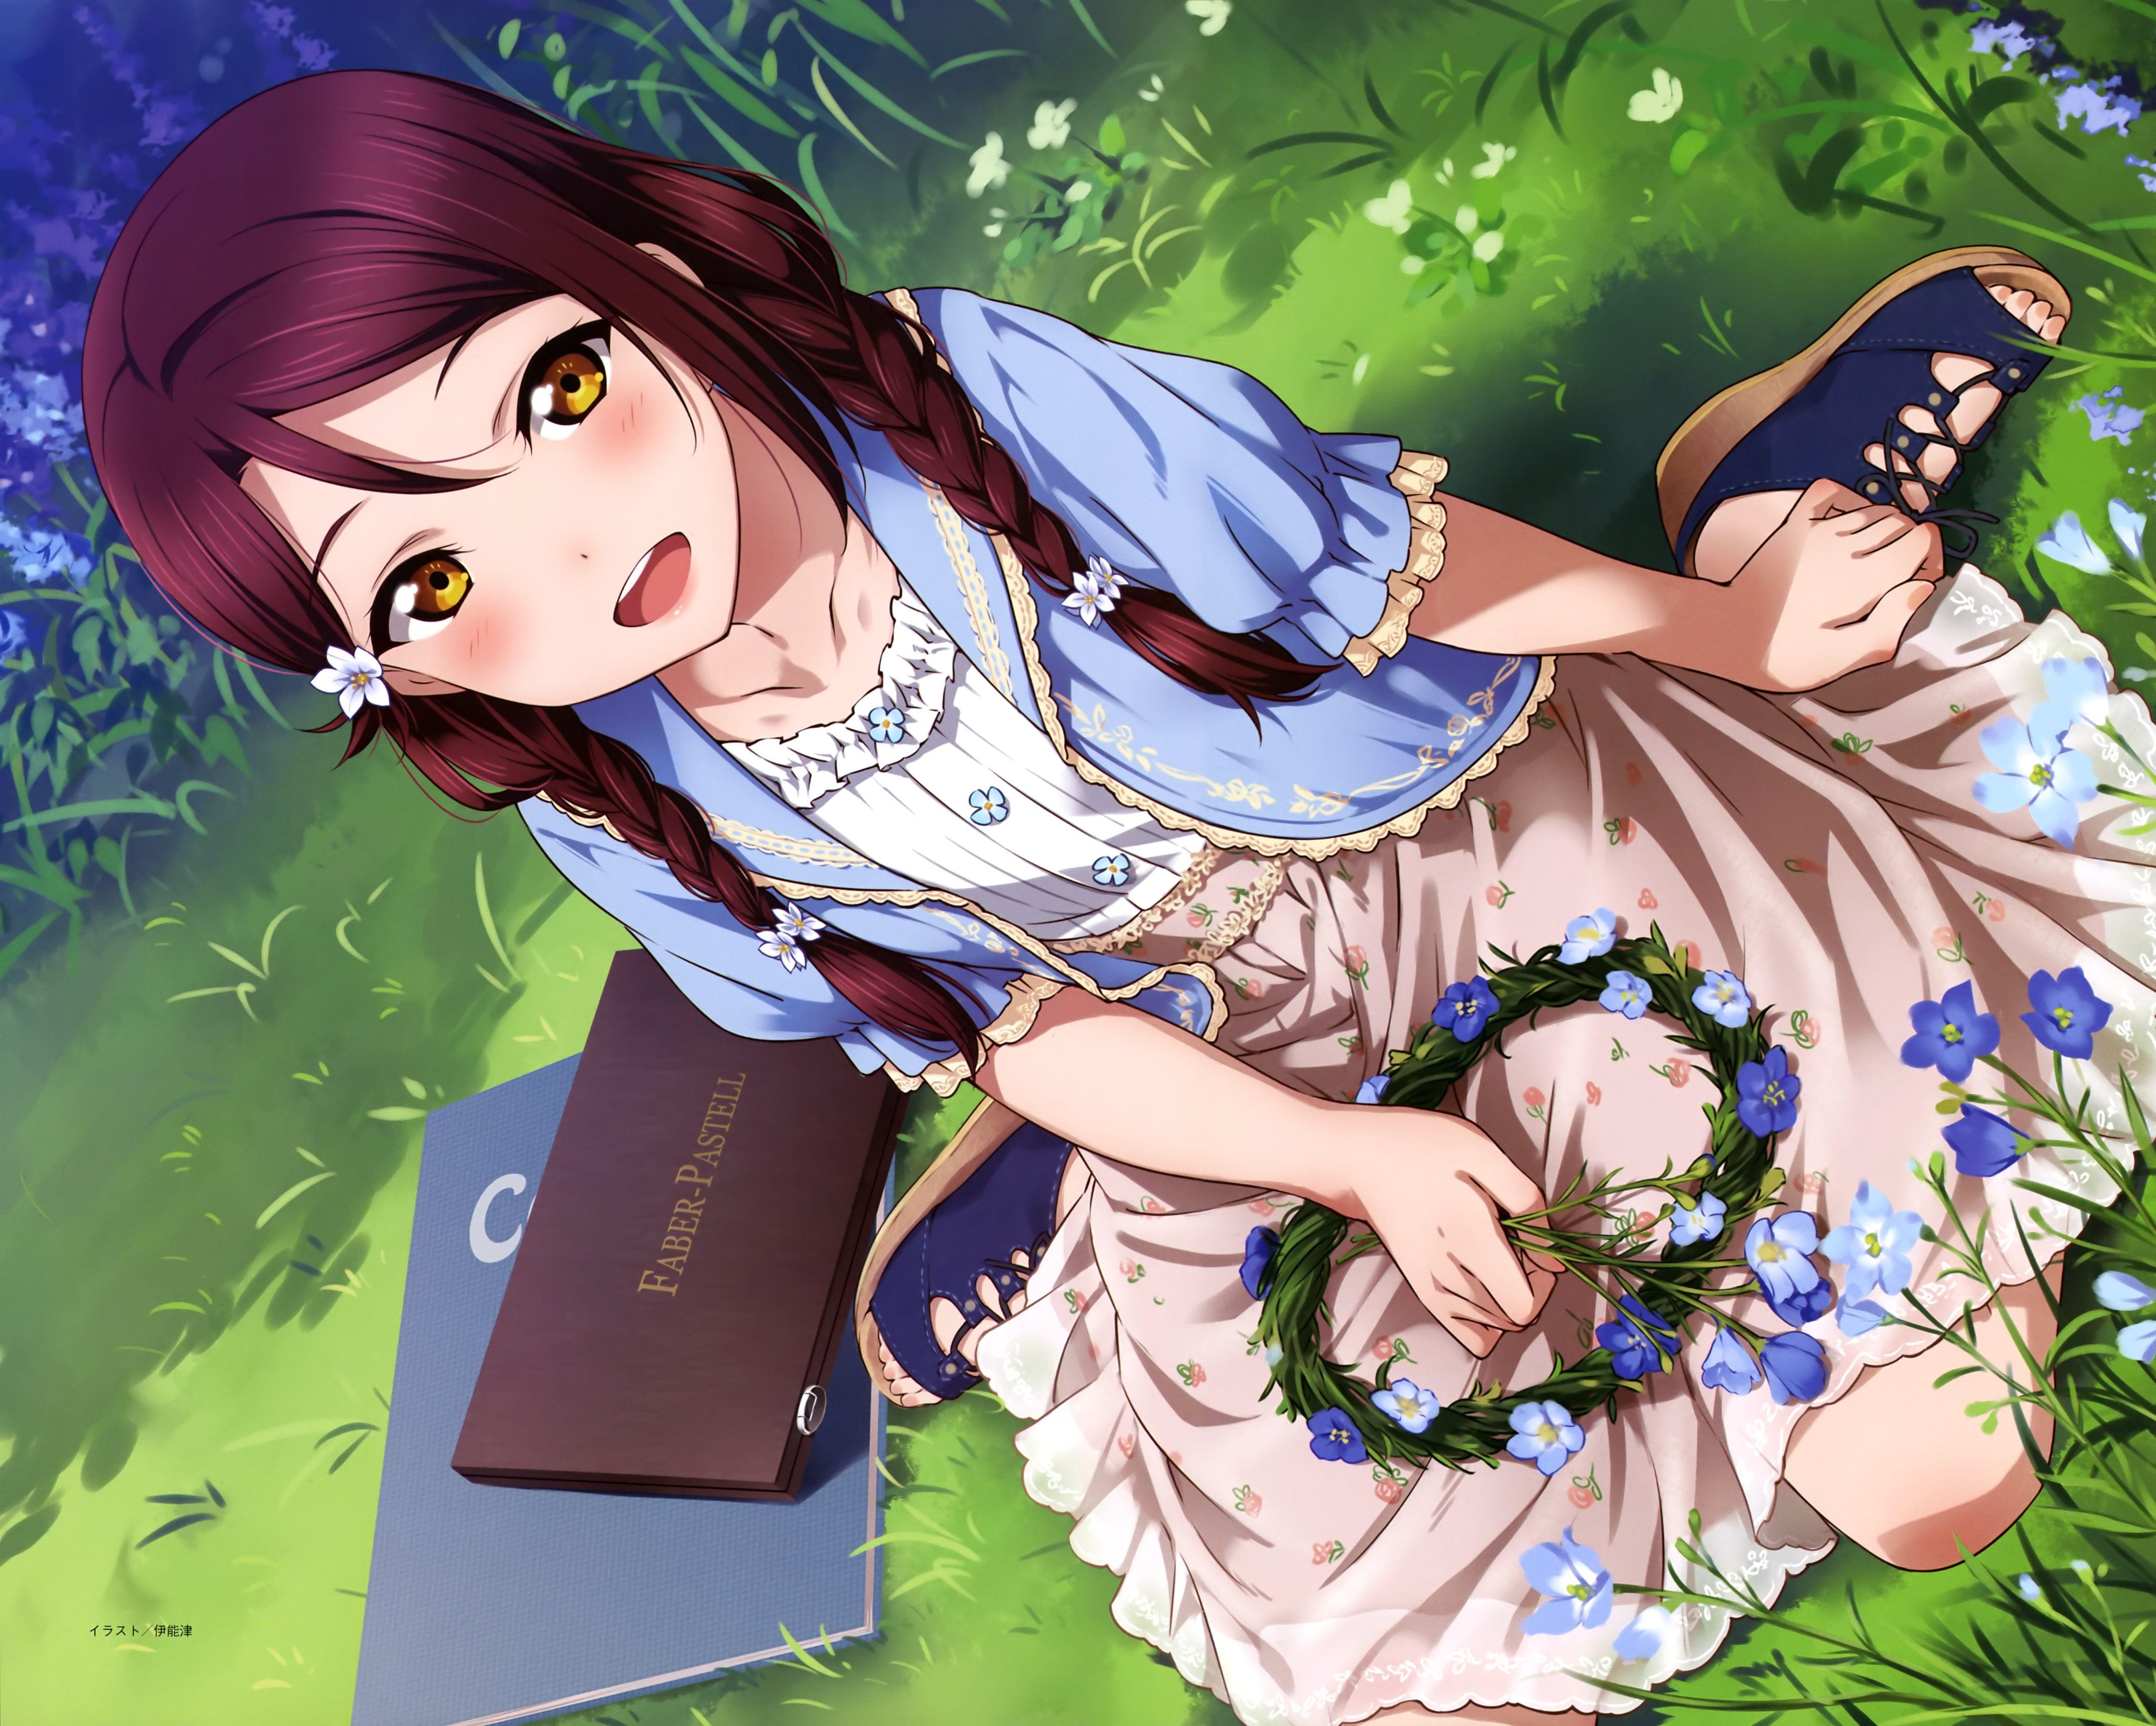 Anime Love Live Sunshine Riko Sakurauchi 4k Wallpaper Hdwallpaper Desktop Anime Kawaii Anime Anime Love